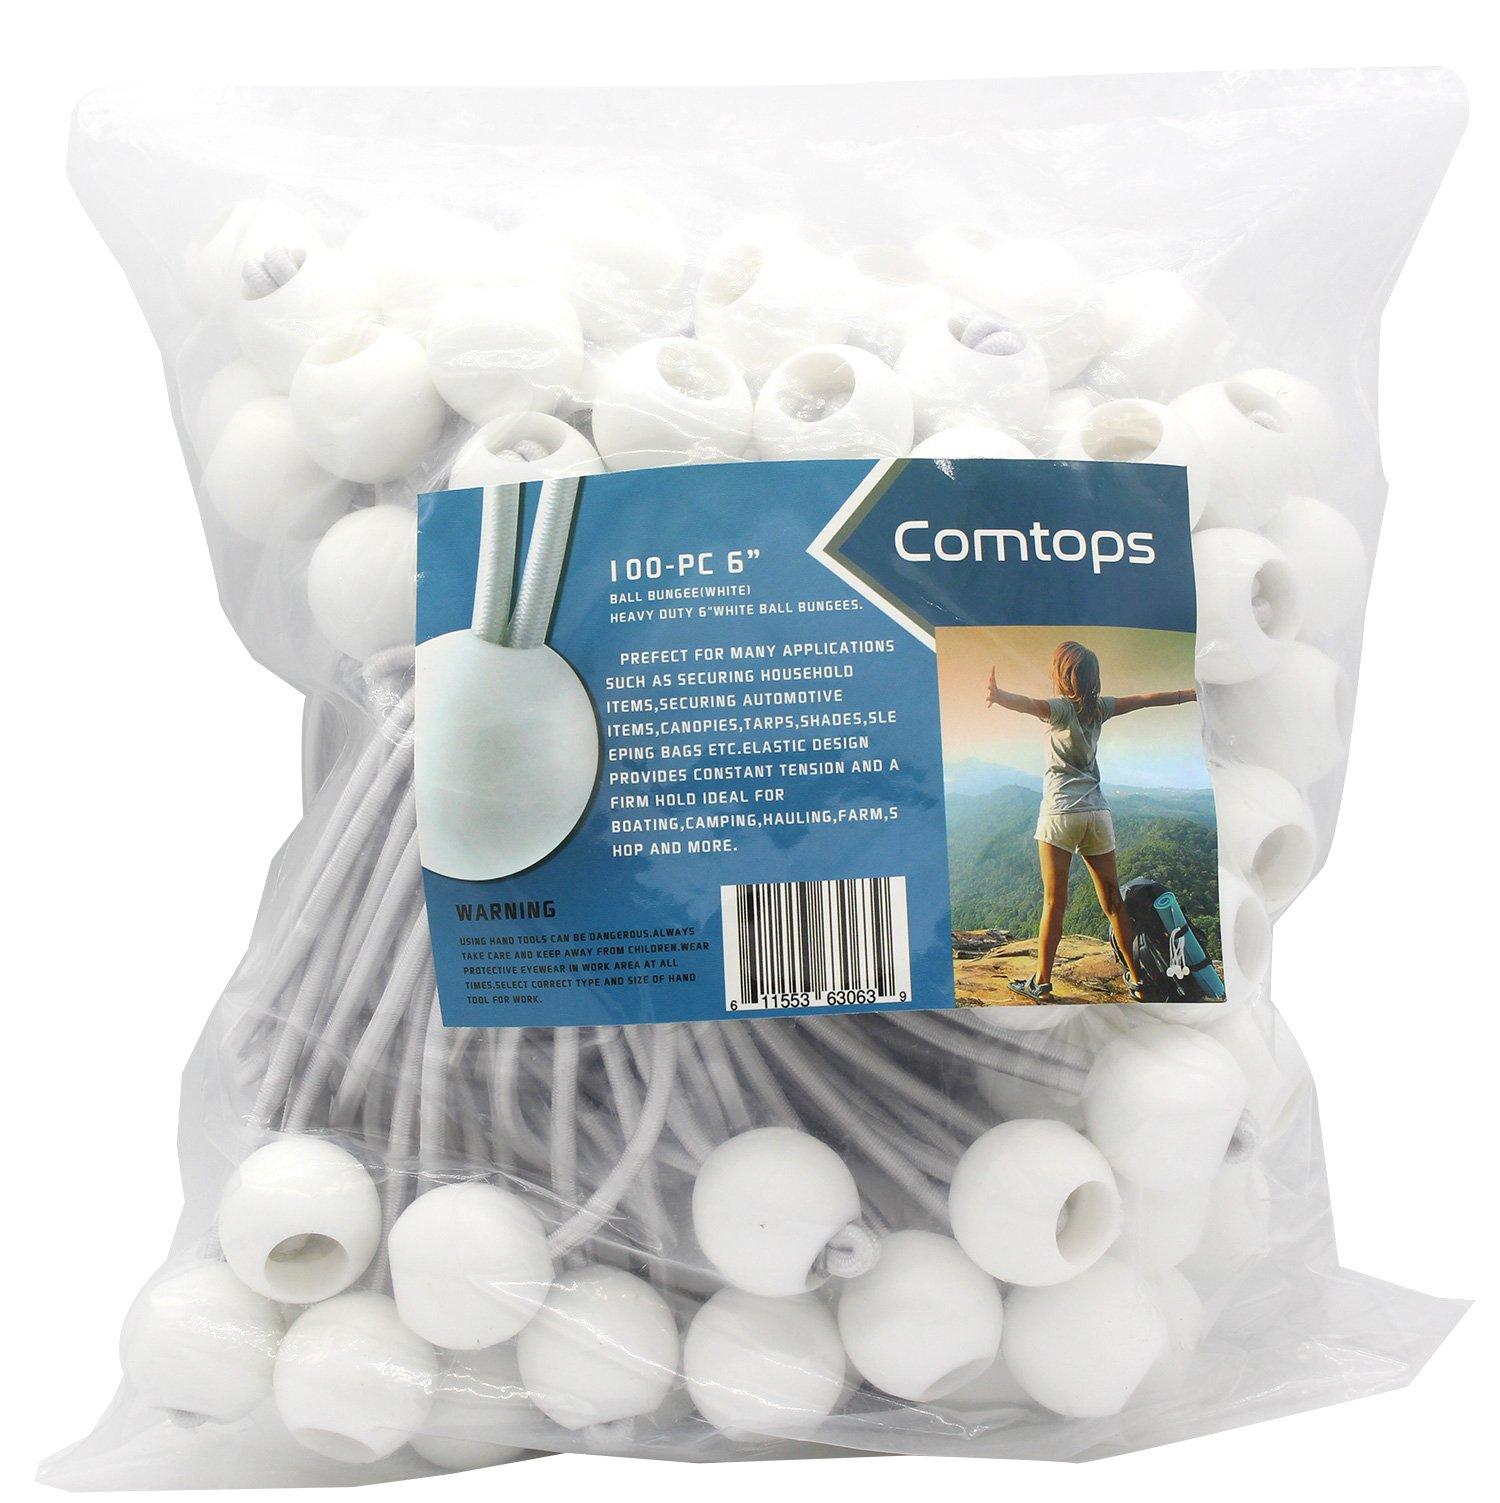 Comtops Heavy duty 6'' 100 PC Ball Bungee Canopy Tarp Tie Down Cord White Color Bonus 6 PK Mini Bungee Cord by Comtops